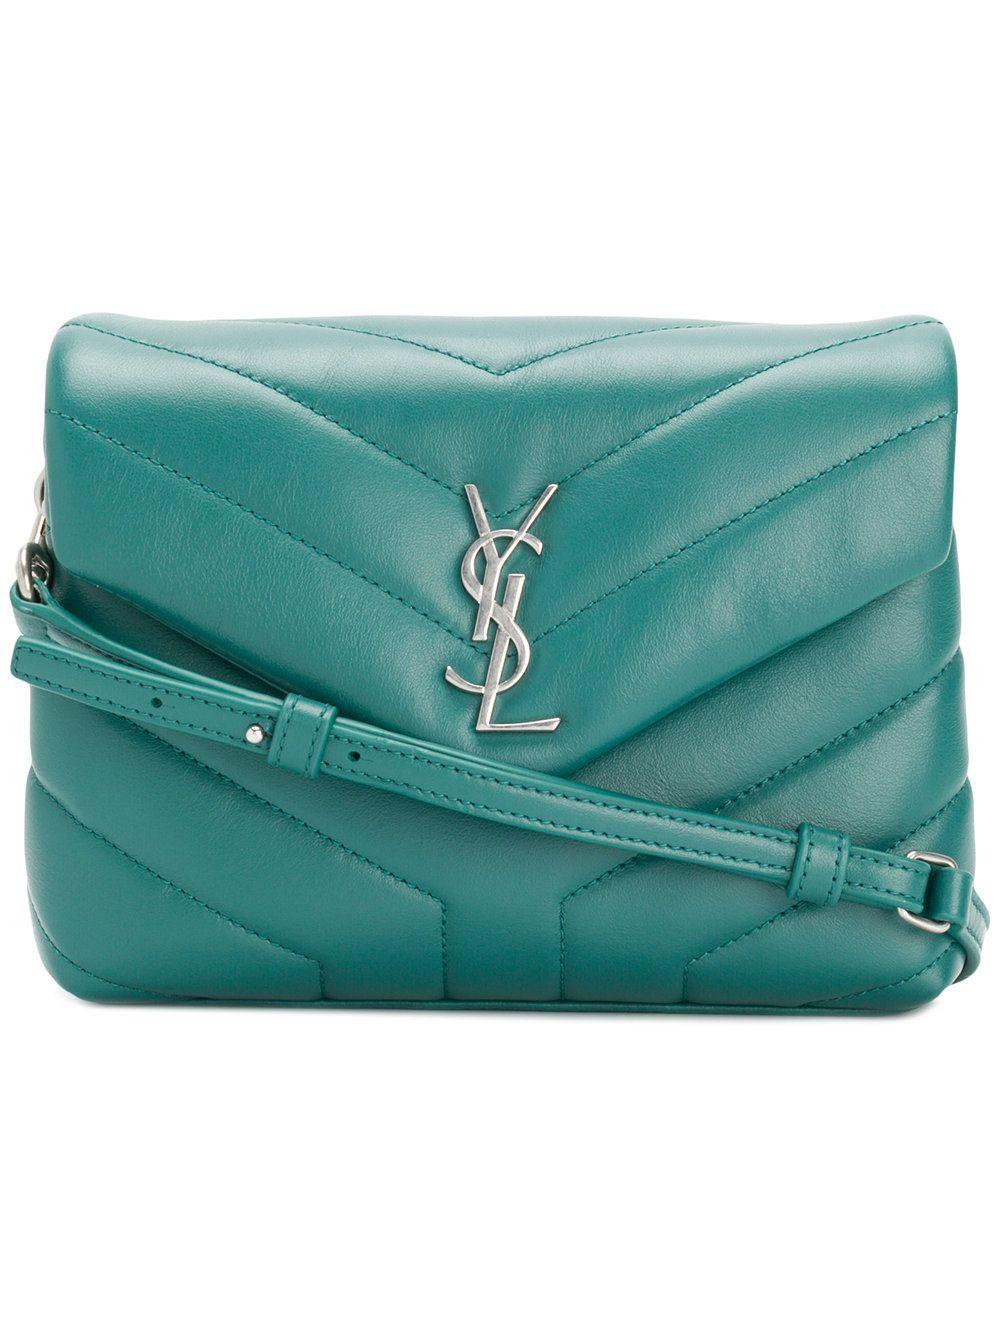 Discounts For Sale Lou Lou shoulder bag - Green Saint Laurent Best Sale Cheap Online Free Shipping Buy Cheap Purchase Best Place To Buy Online 1CsmH